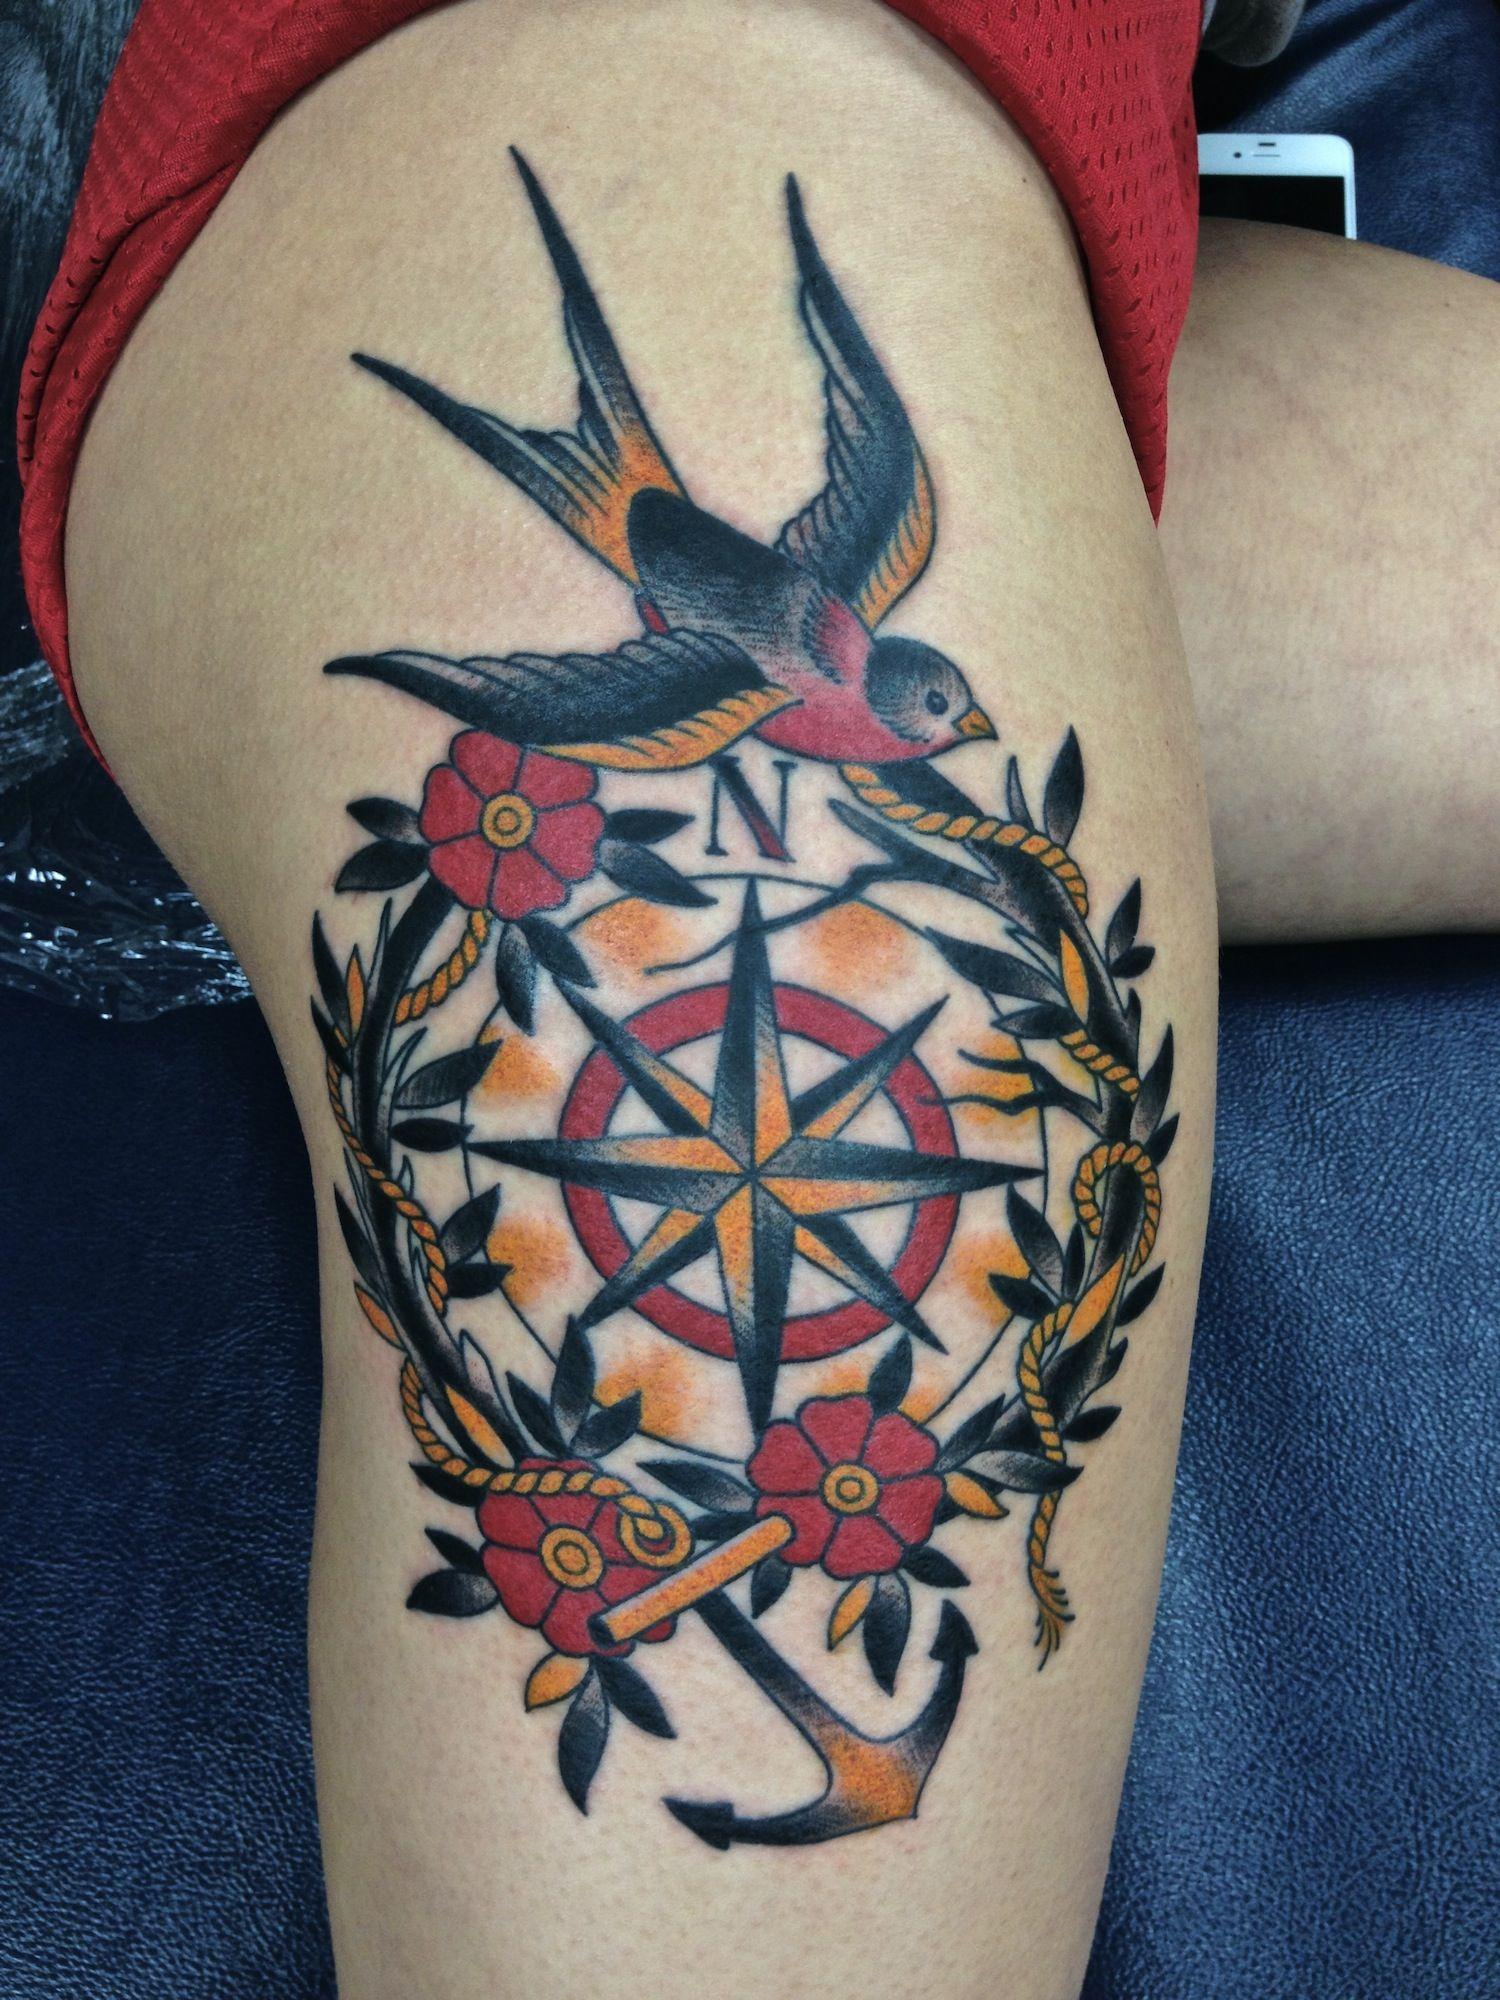 Compass tattoos design ideas for men and women